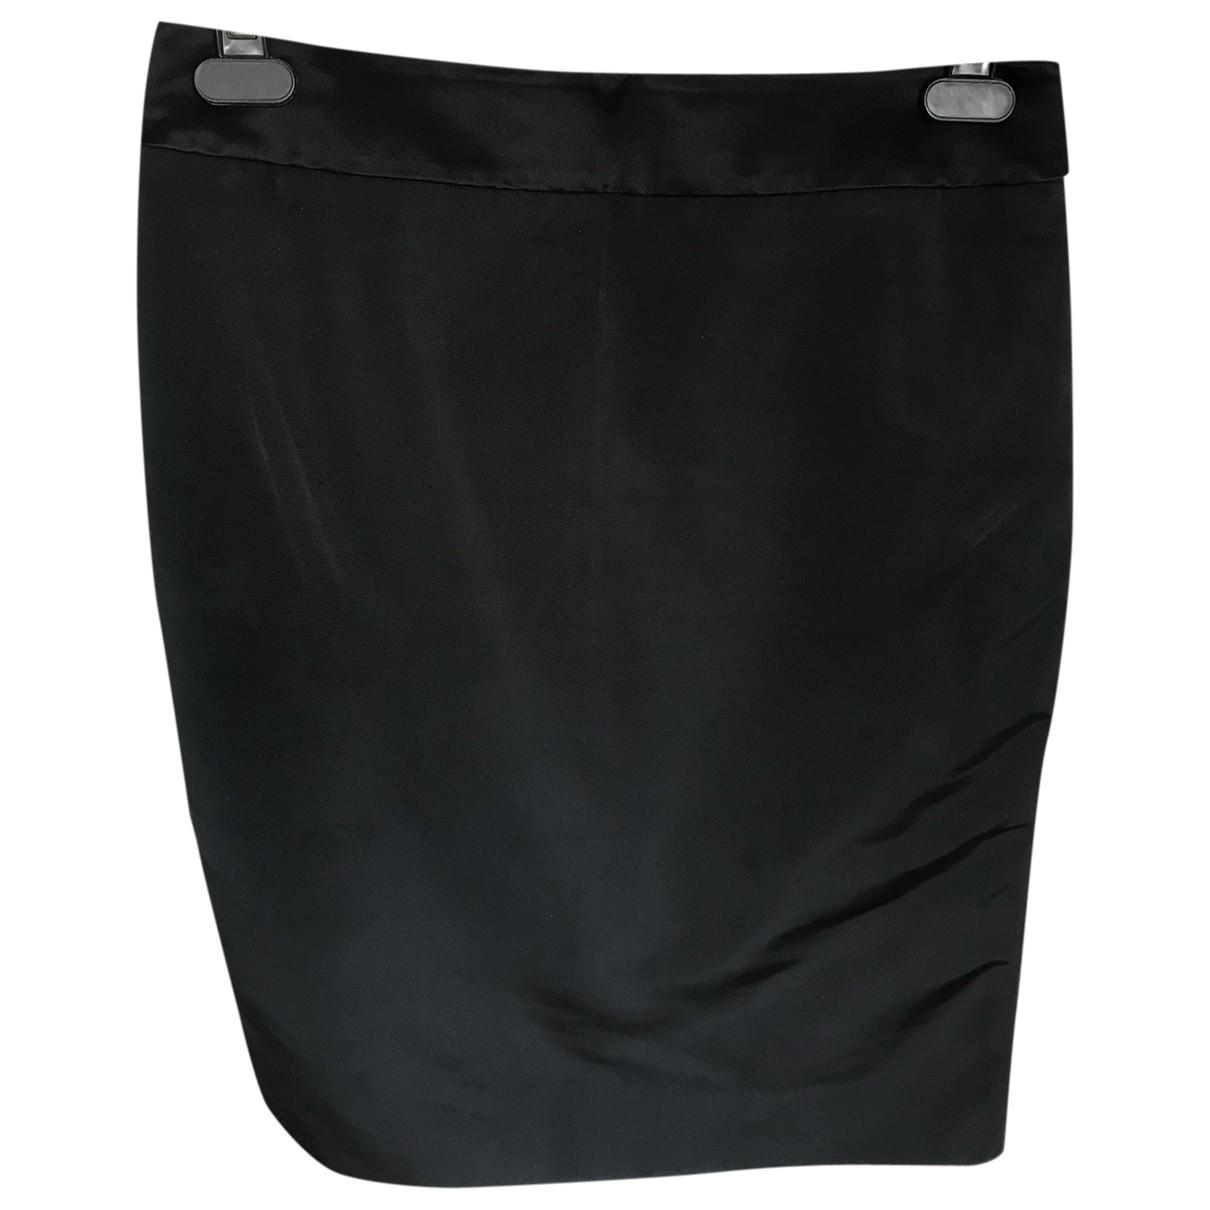 Armani Collezioni \N Black skirt for Women 42 IT